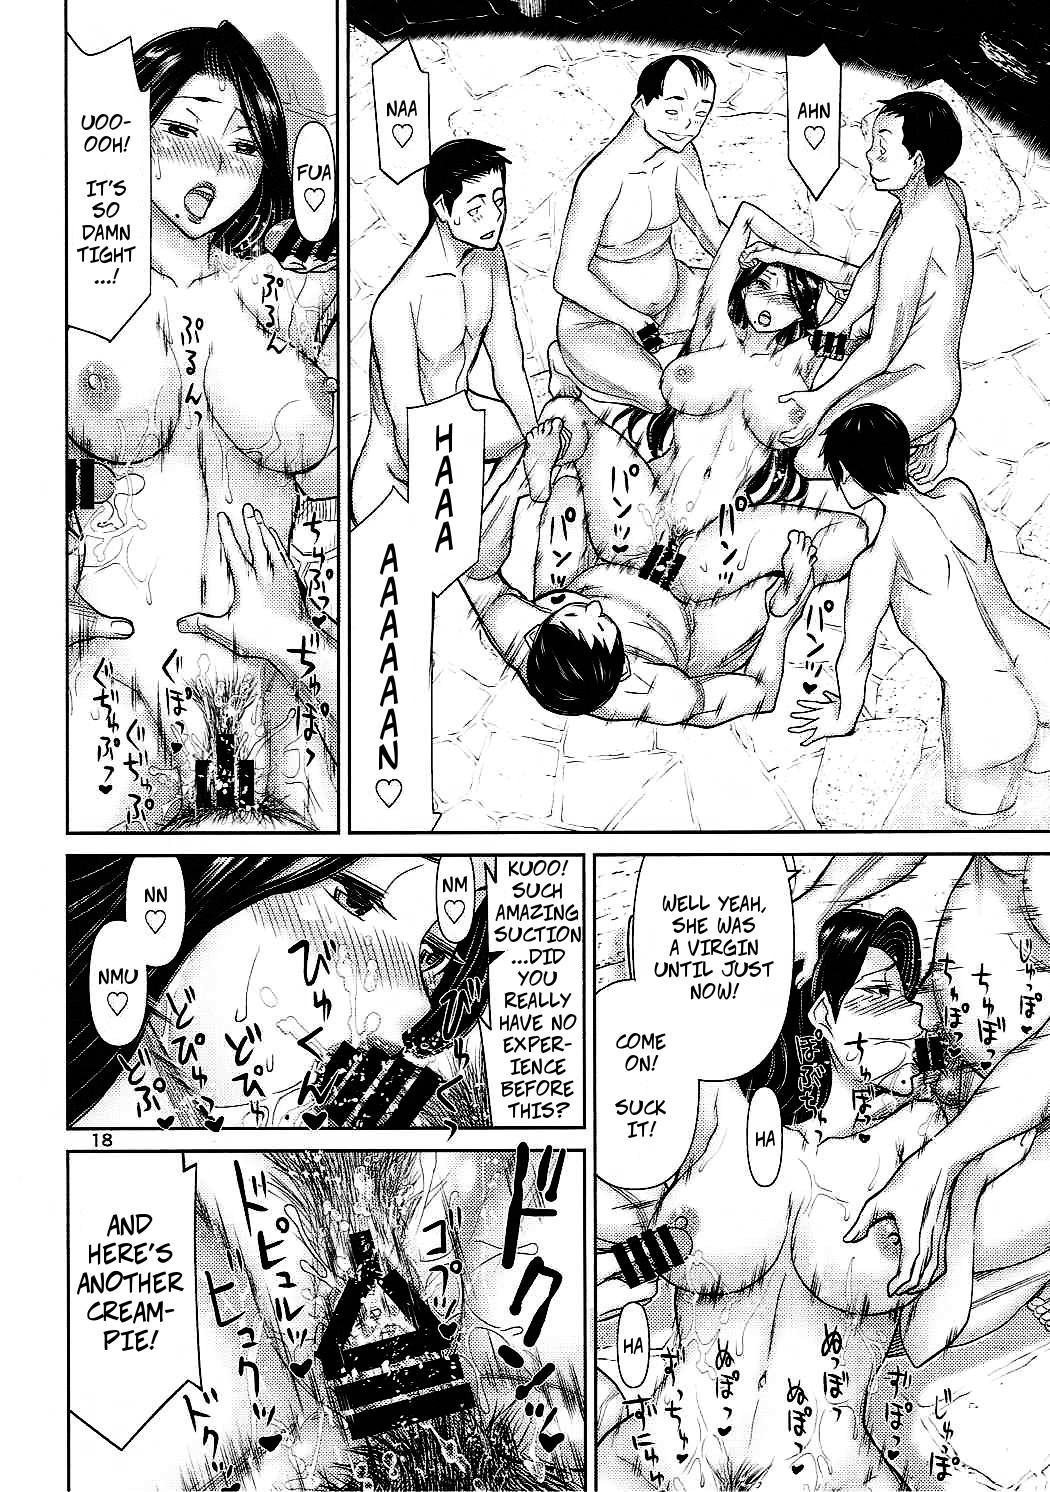 (C90) [Low Thrust (Tsunagami)] Igi nashi -- No Objection (Ace Attorney) [English] 16